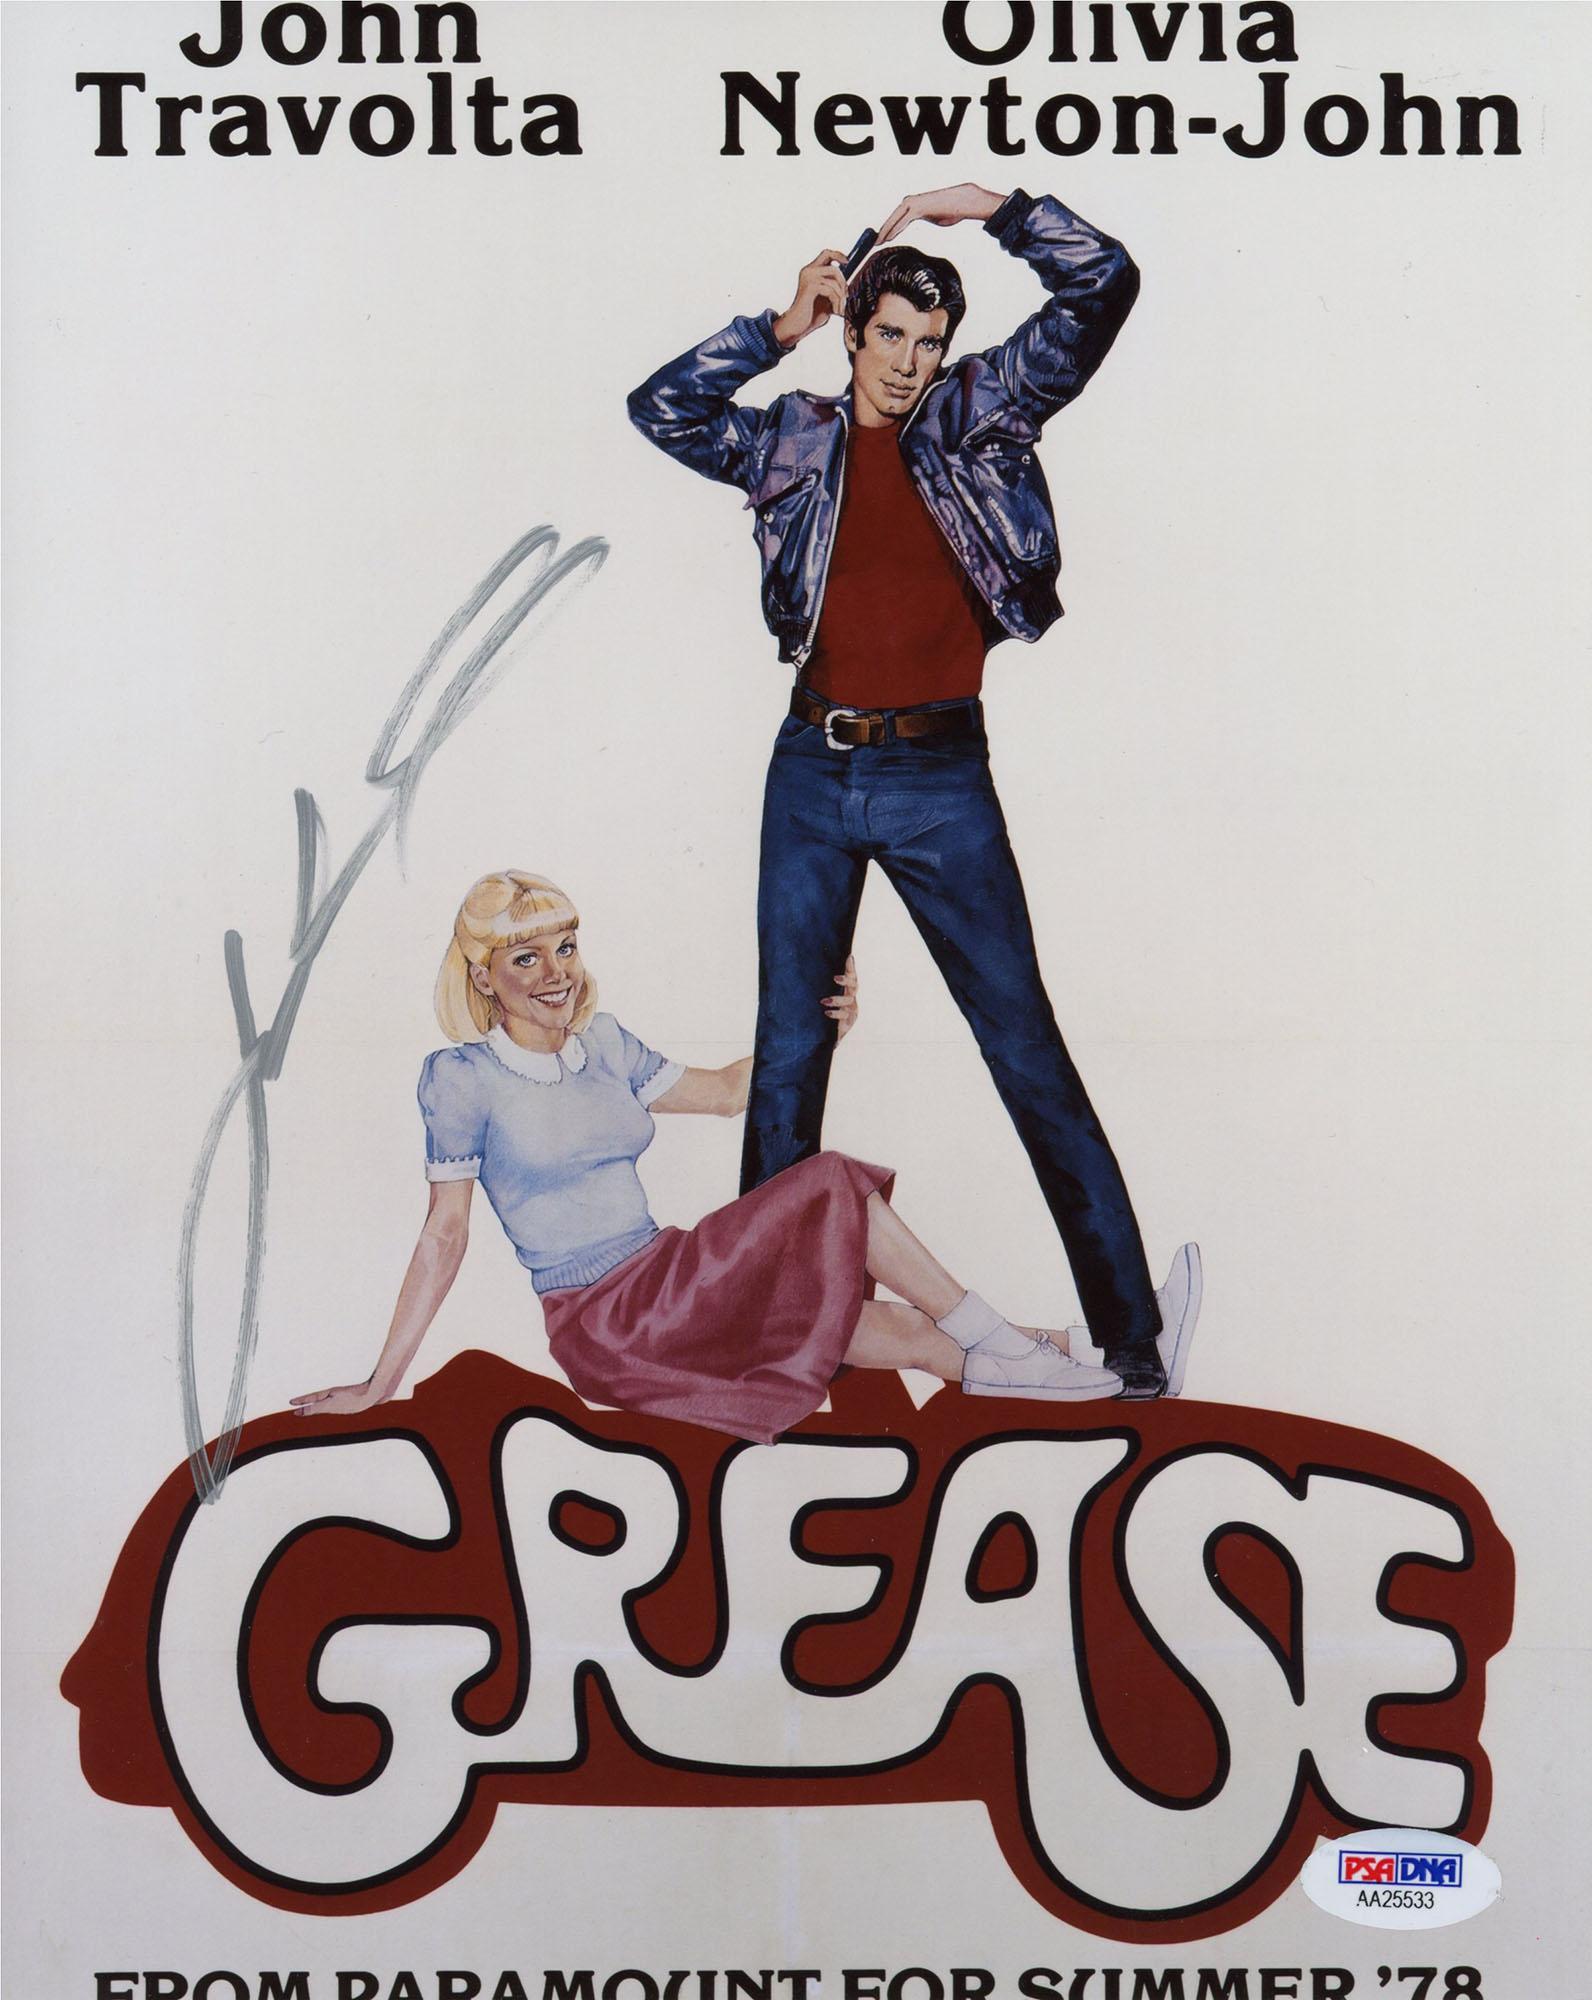 "John Travolta Autographed 8"" x 10"" Grease Photograph - PSA/DNA"